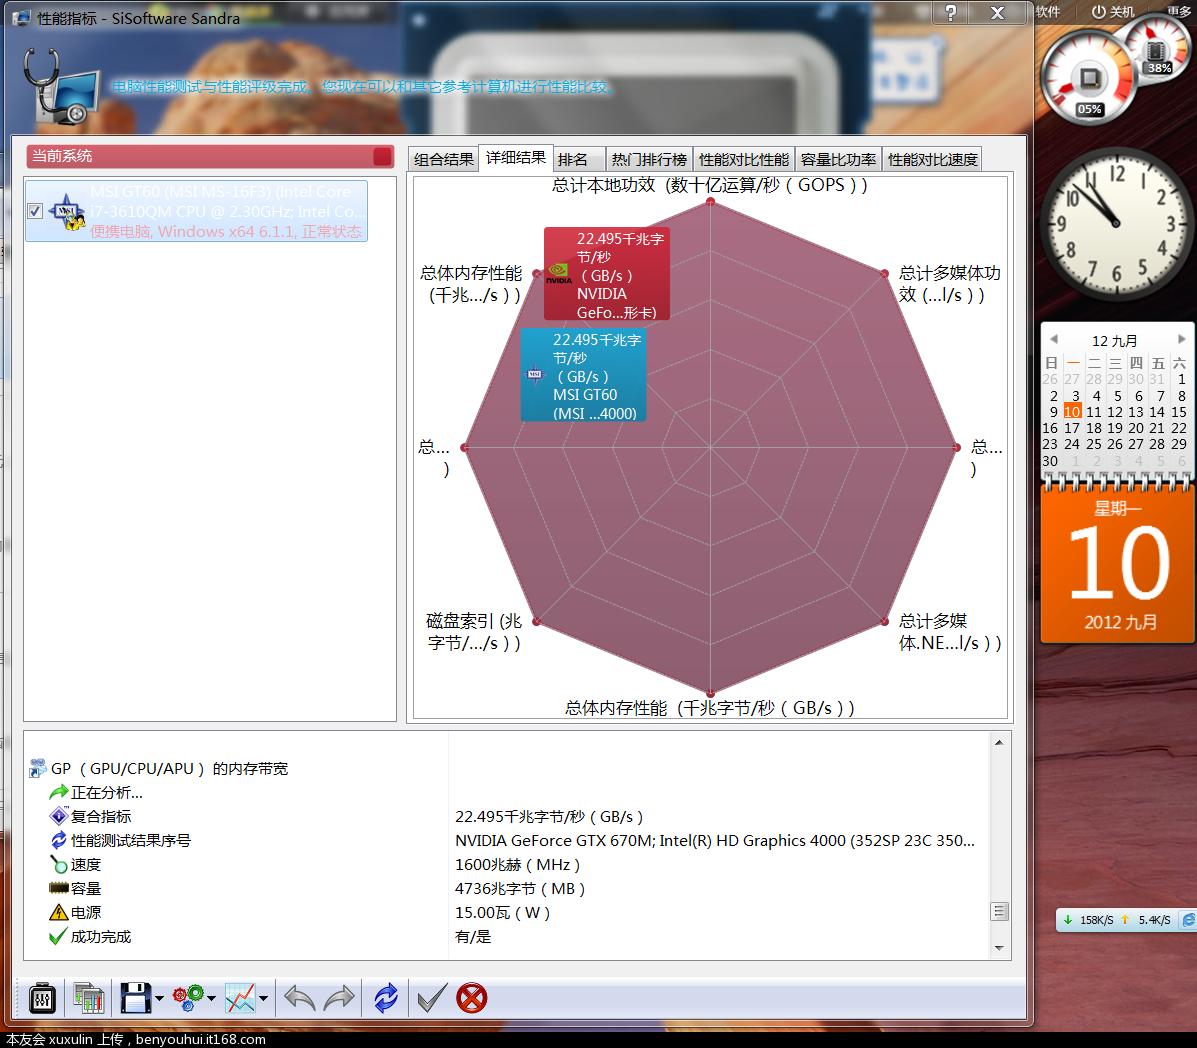 Sisoftware Sandra 截图10.PNG